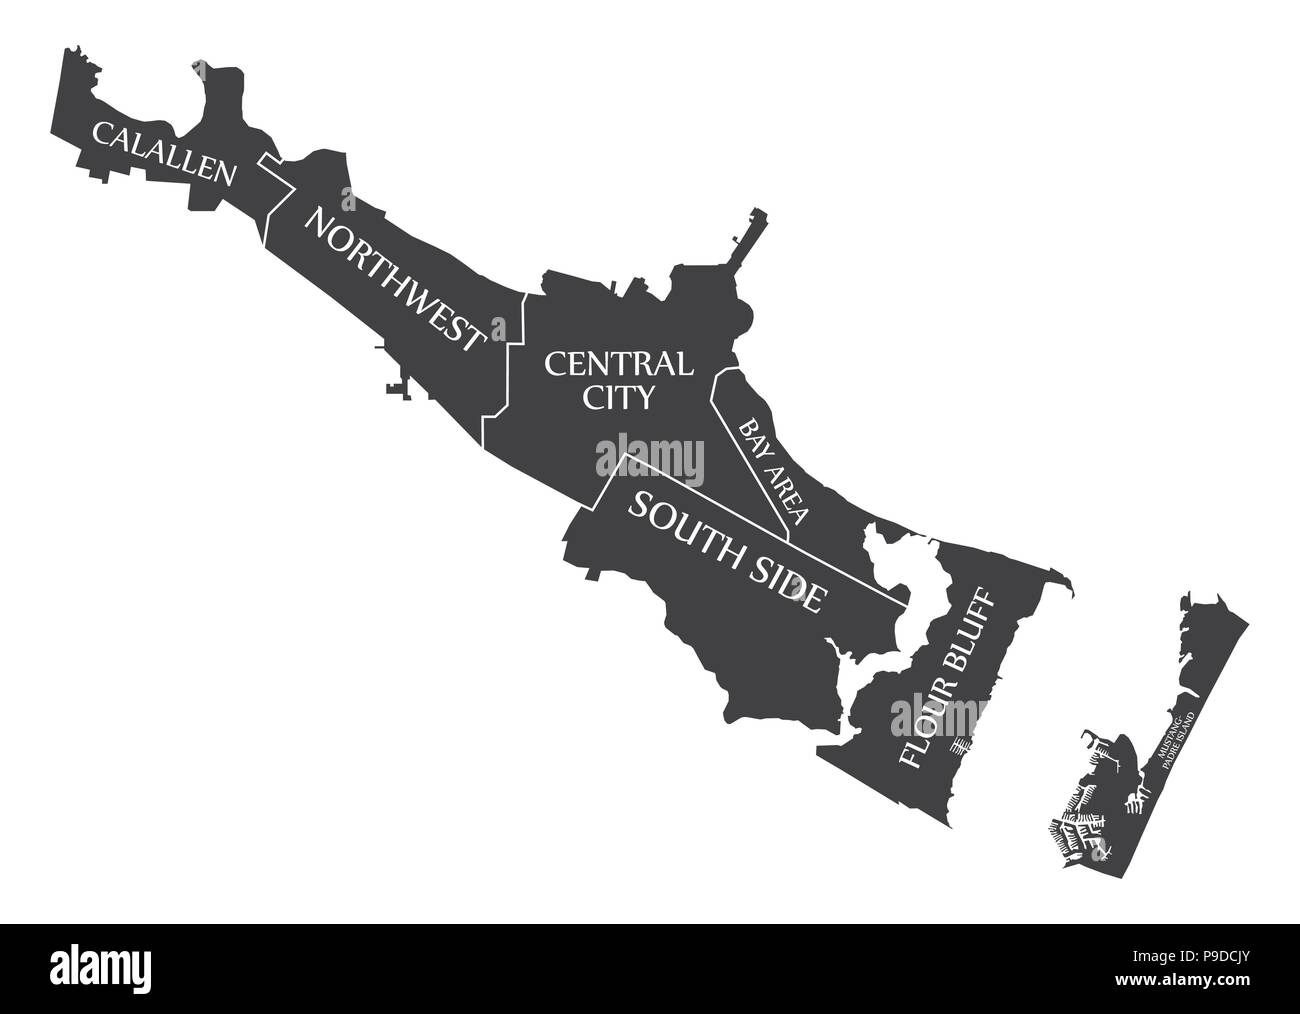 Corpus Christi Texas city map USA labelled black illustration - Stock Vector